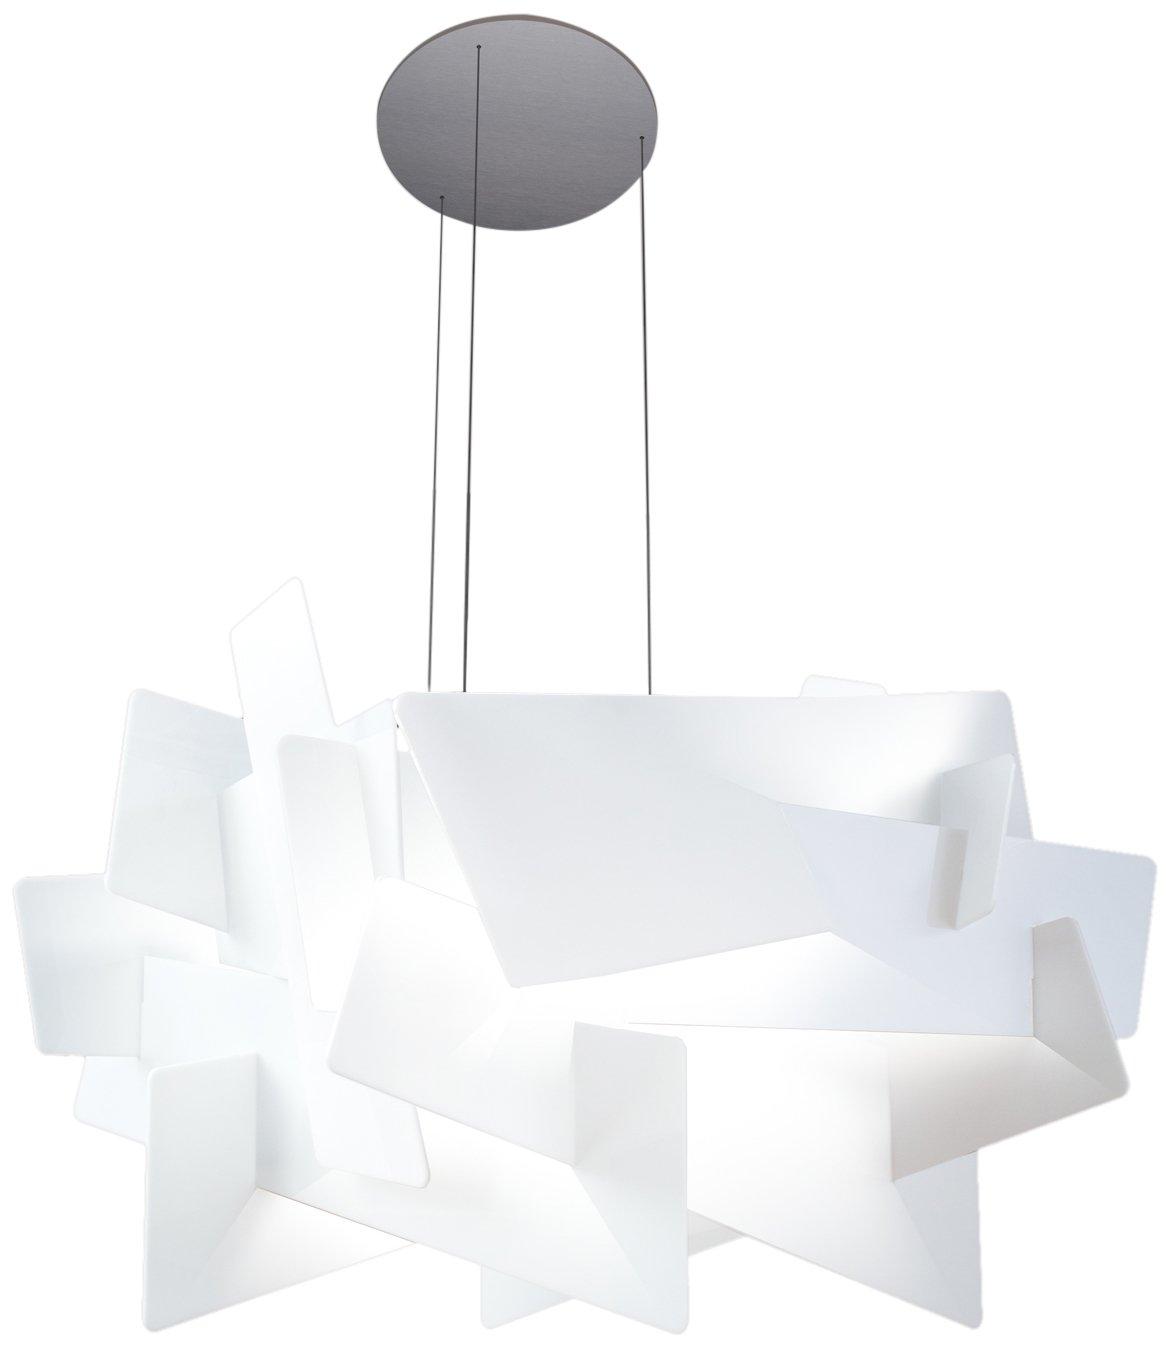 Nodor Artic Island Decorativa Blanco 790m³/h - Campana (790 m³/h, Canalizado, 49 dB, 63 dB, Decorativa, Blanco): Amazon.es: Hogar